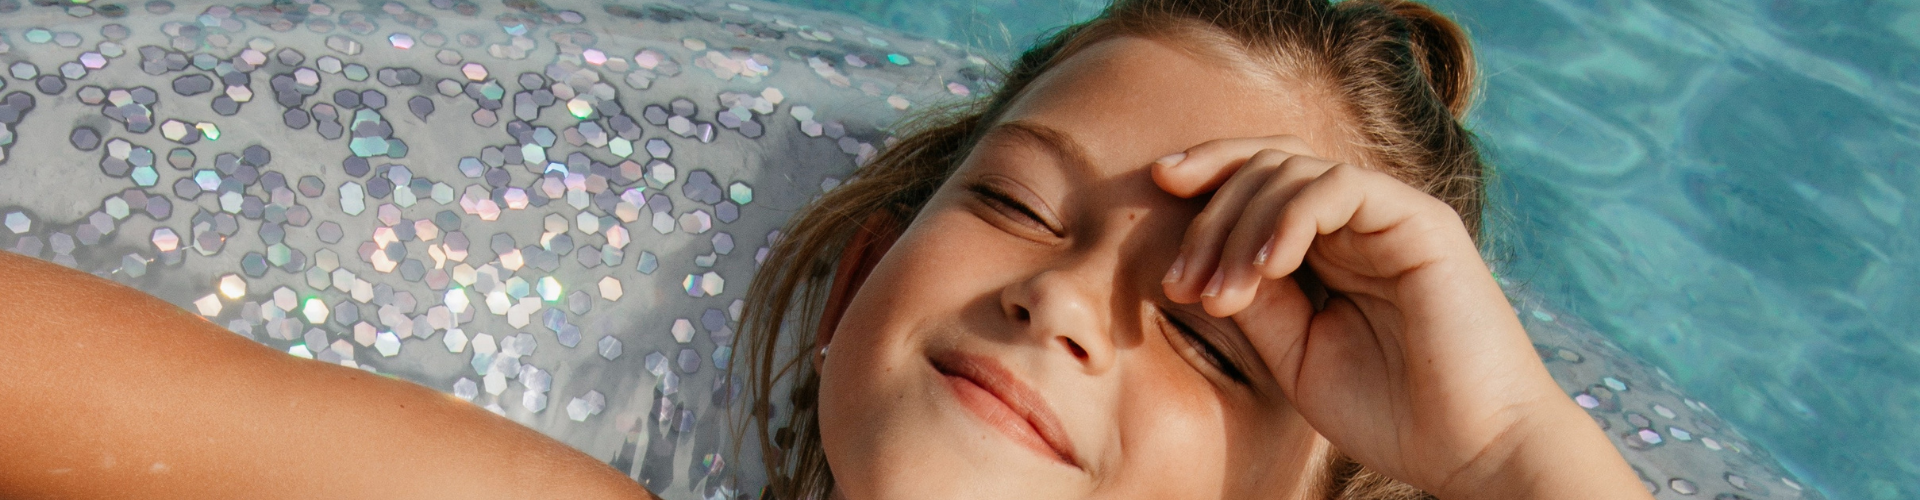 Blog-Swim-Spas-Kids-Entertainment-Activities